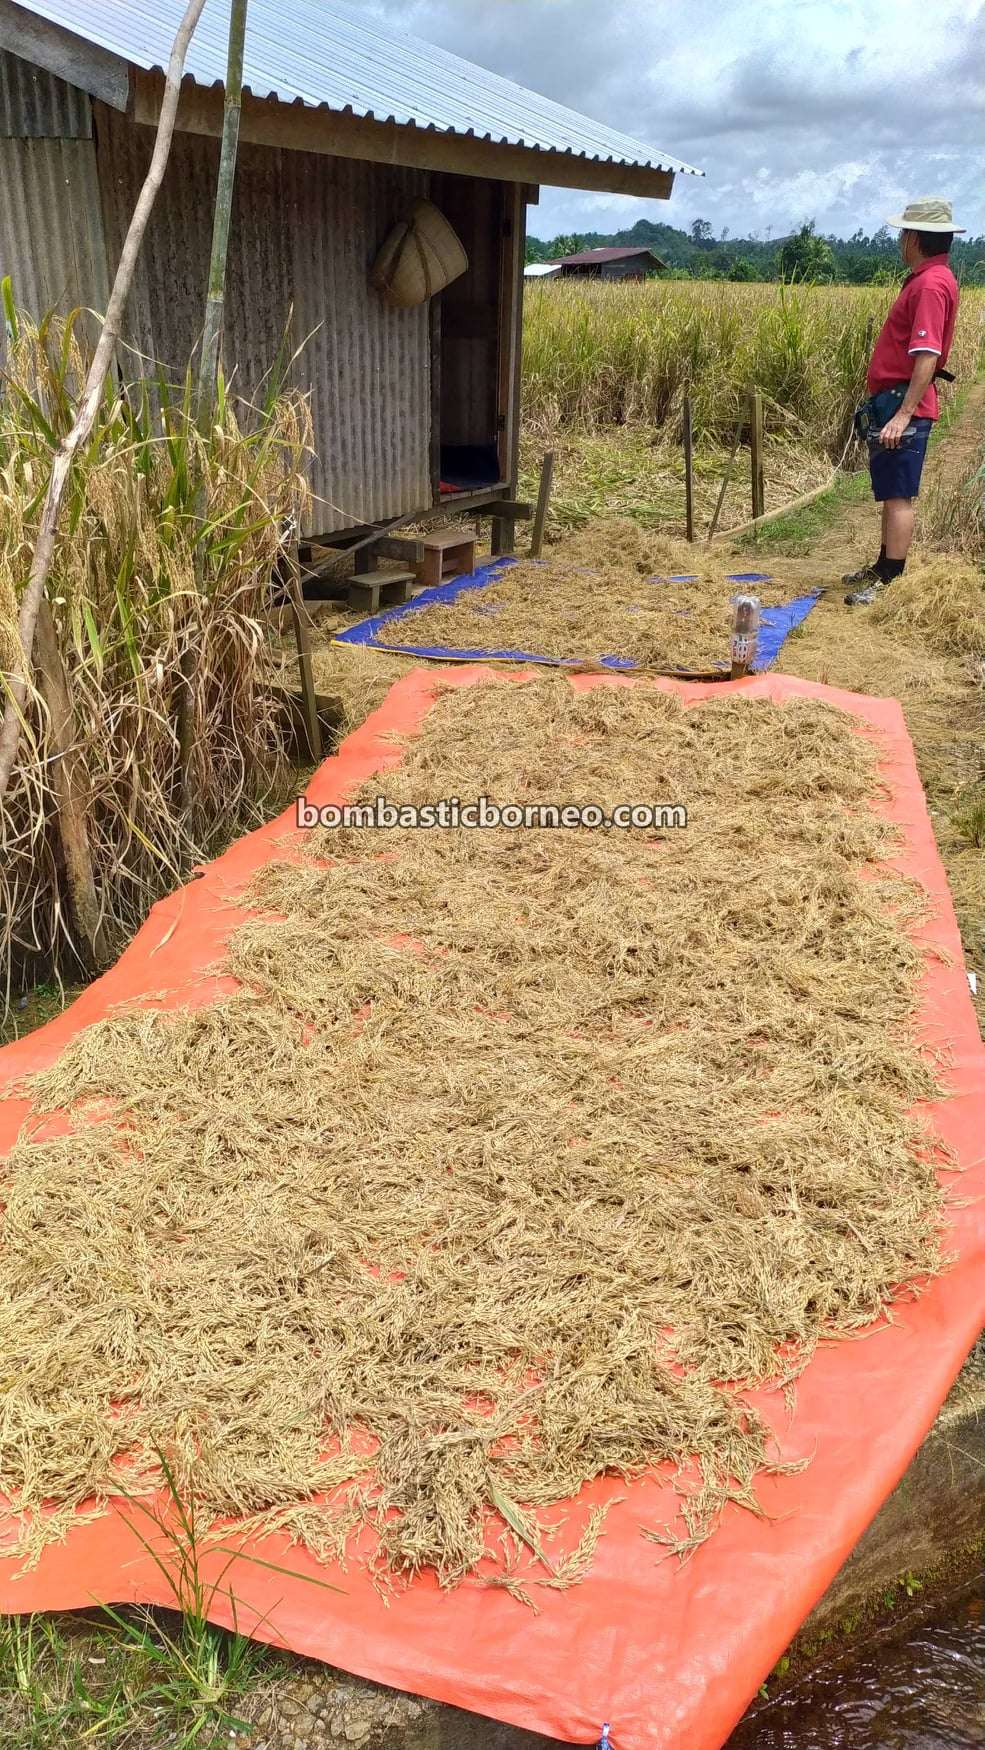 Kampung Bunan Gega, Paddy Farming, Paddy field, Paddy harvesting, Sawah Padi, Dayak Bidayuh, authentic, traditional, Serian, Sarawak, Malaysia, Tourism, tourist attraction, travel locally, Borneo,